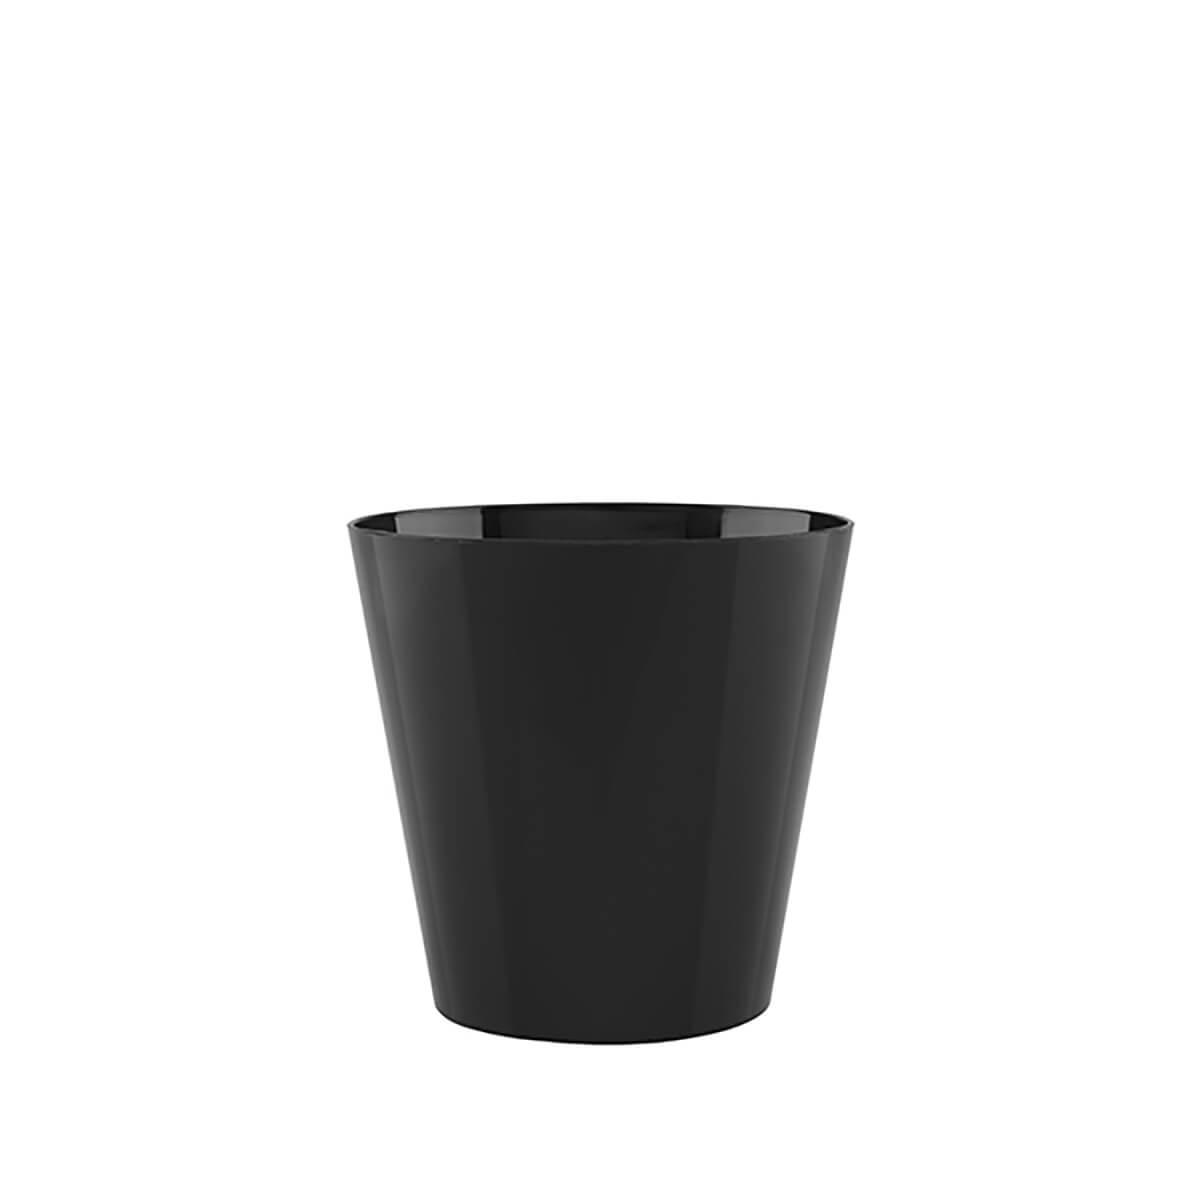 Vaso Porto 18x16 cm VASART